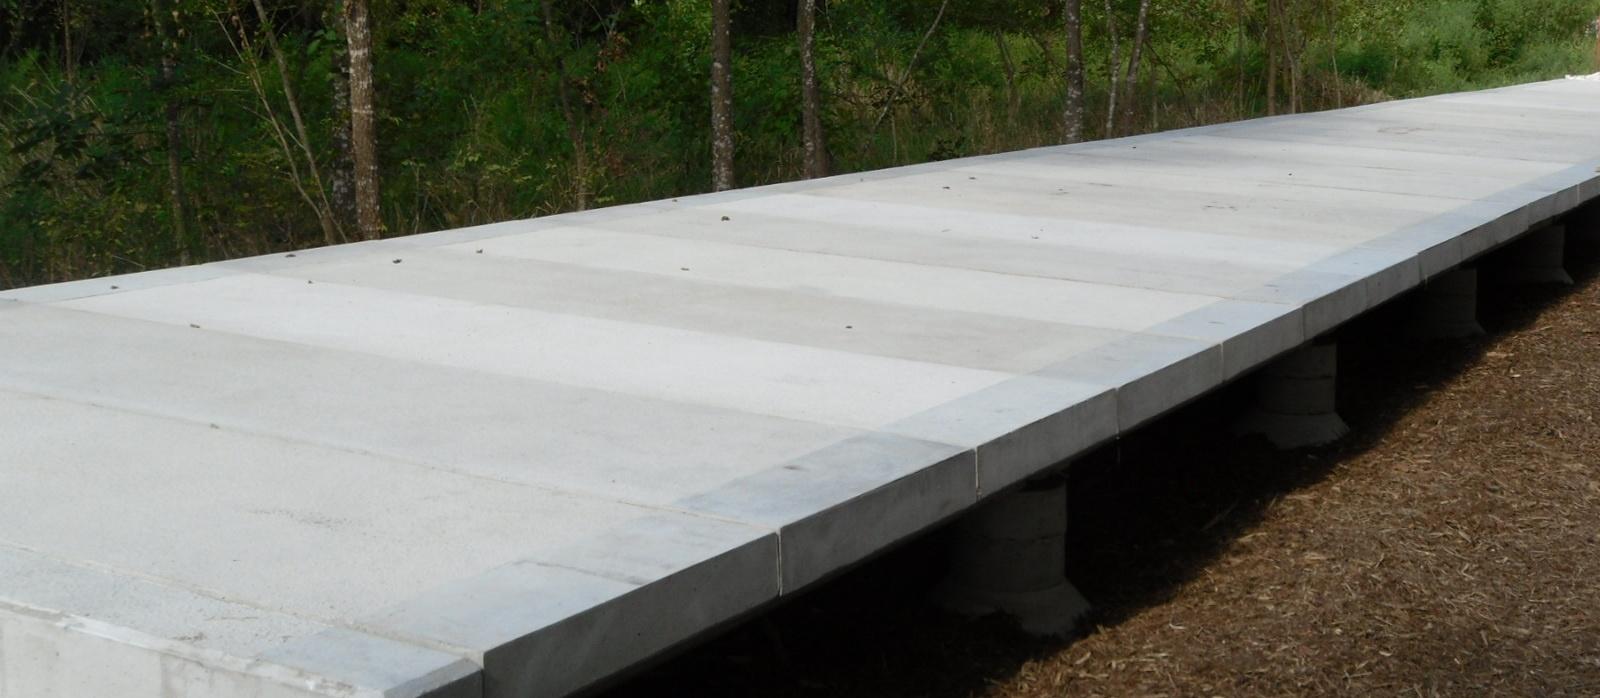 Clabber-creek-trail-permatrak-concrete-boardwalk.jpg